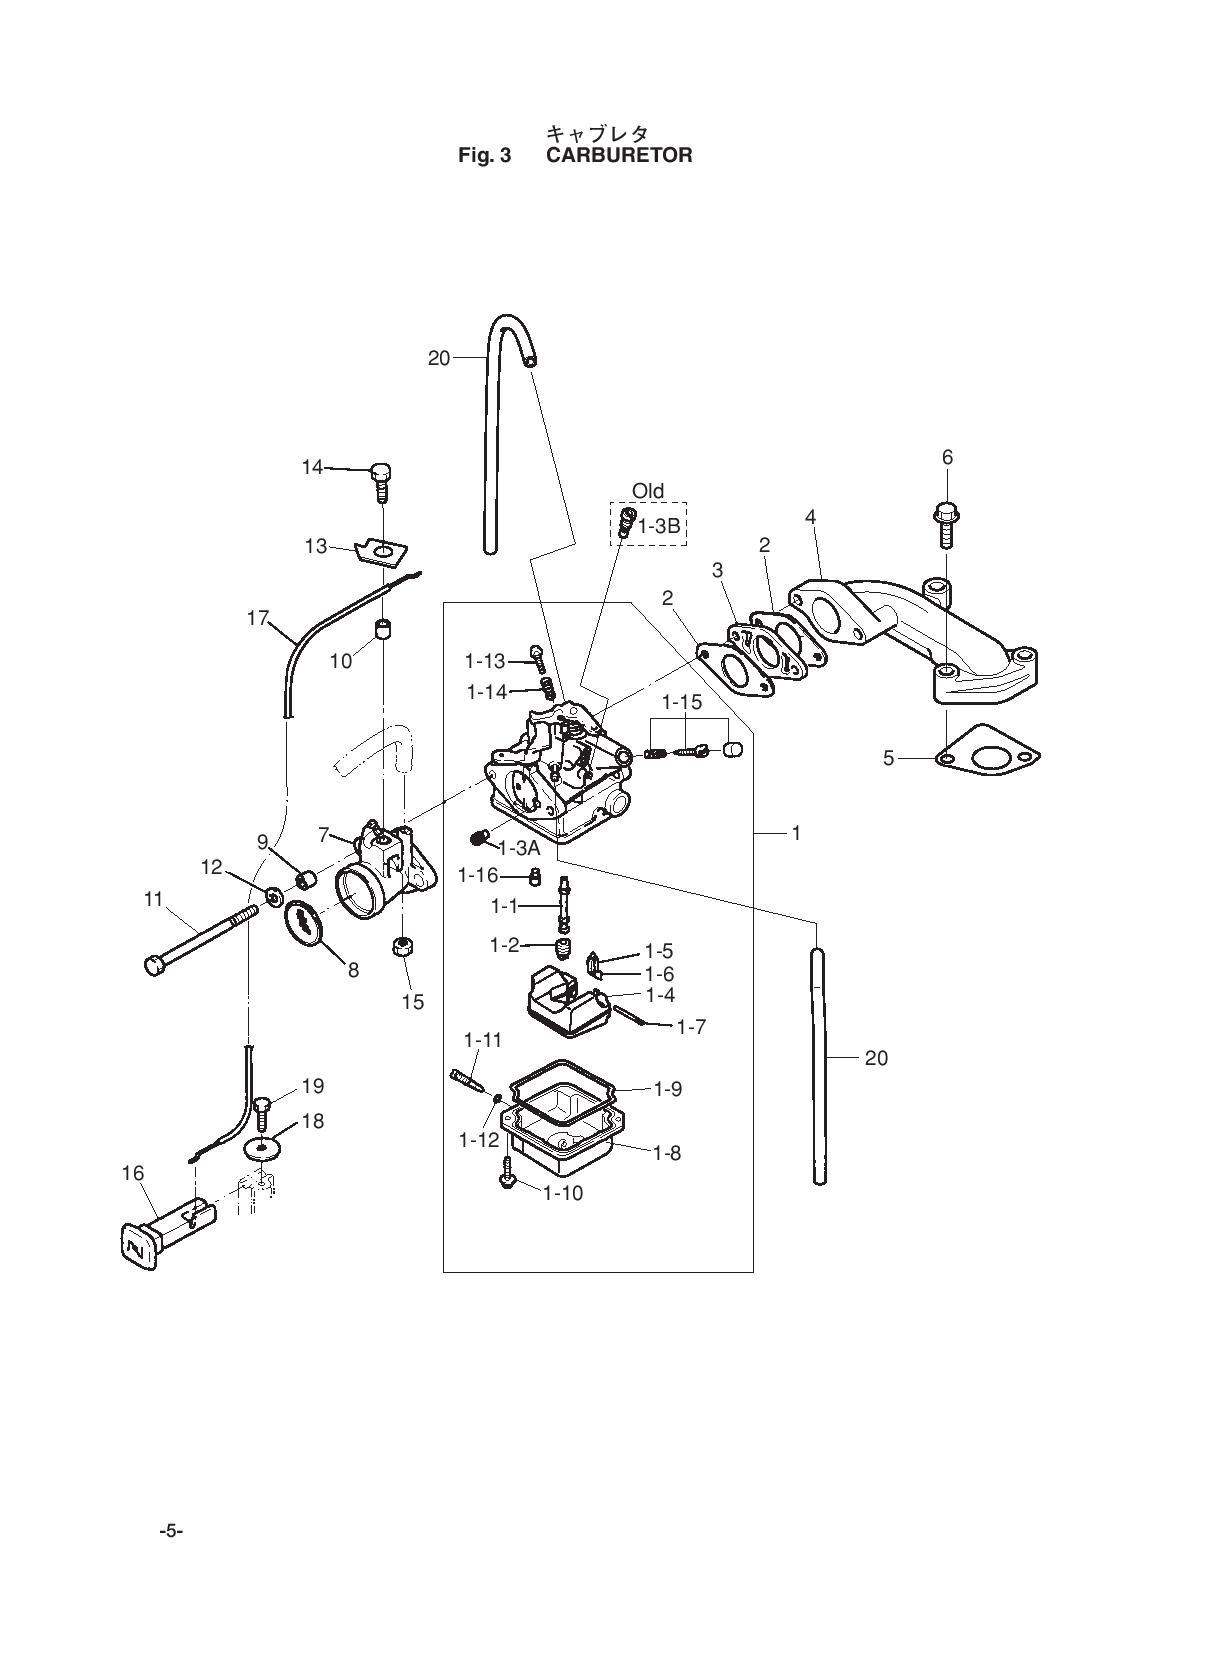 устройство карбюратора китайского лодочного мотора